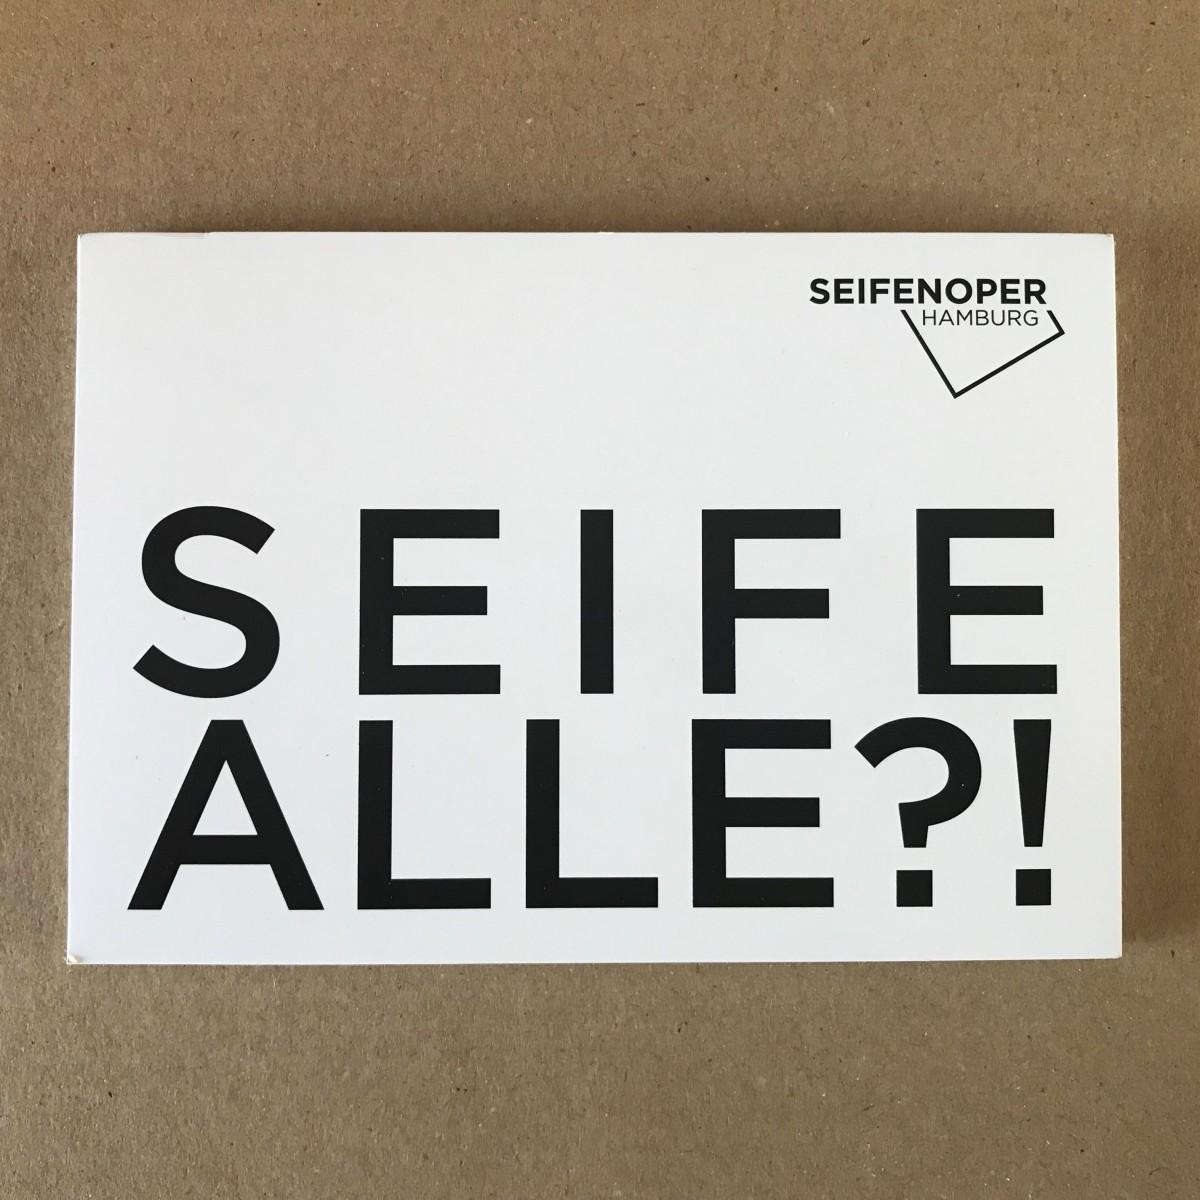 STUDIOBUEHLER Seifenoper Hamburg Kunstobjekt - Ersatzseifen